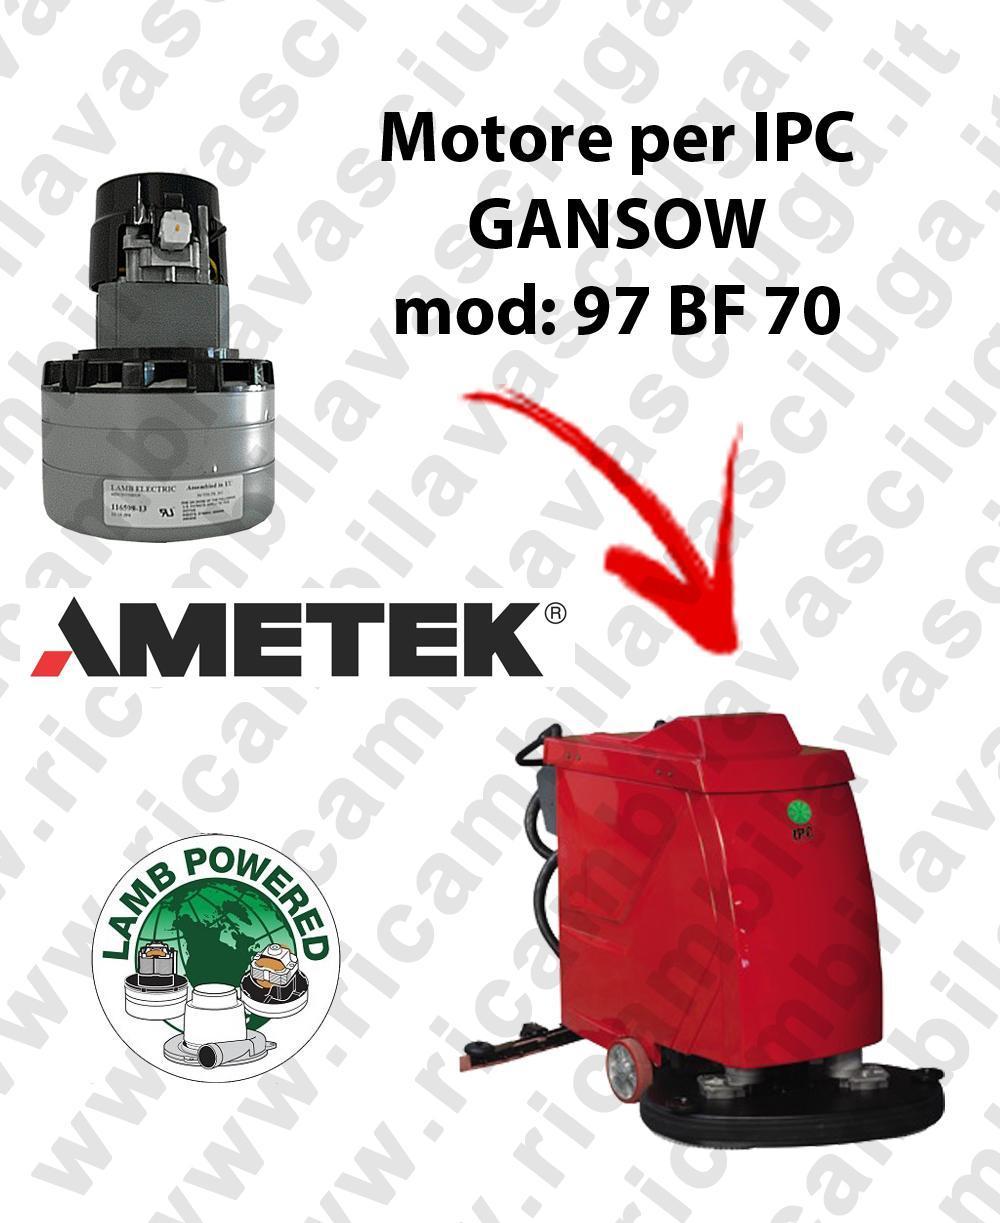 97 BF 70 LAMB AMETEK vacuum motor for scrubber dryer IPC GANSOW